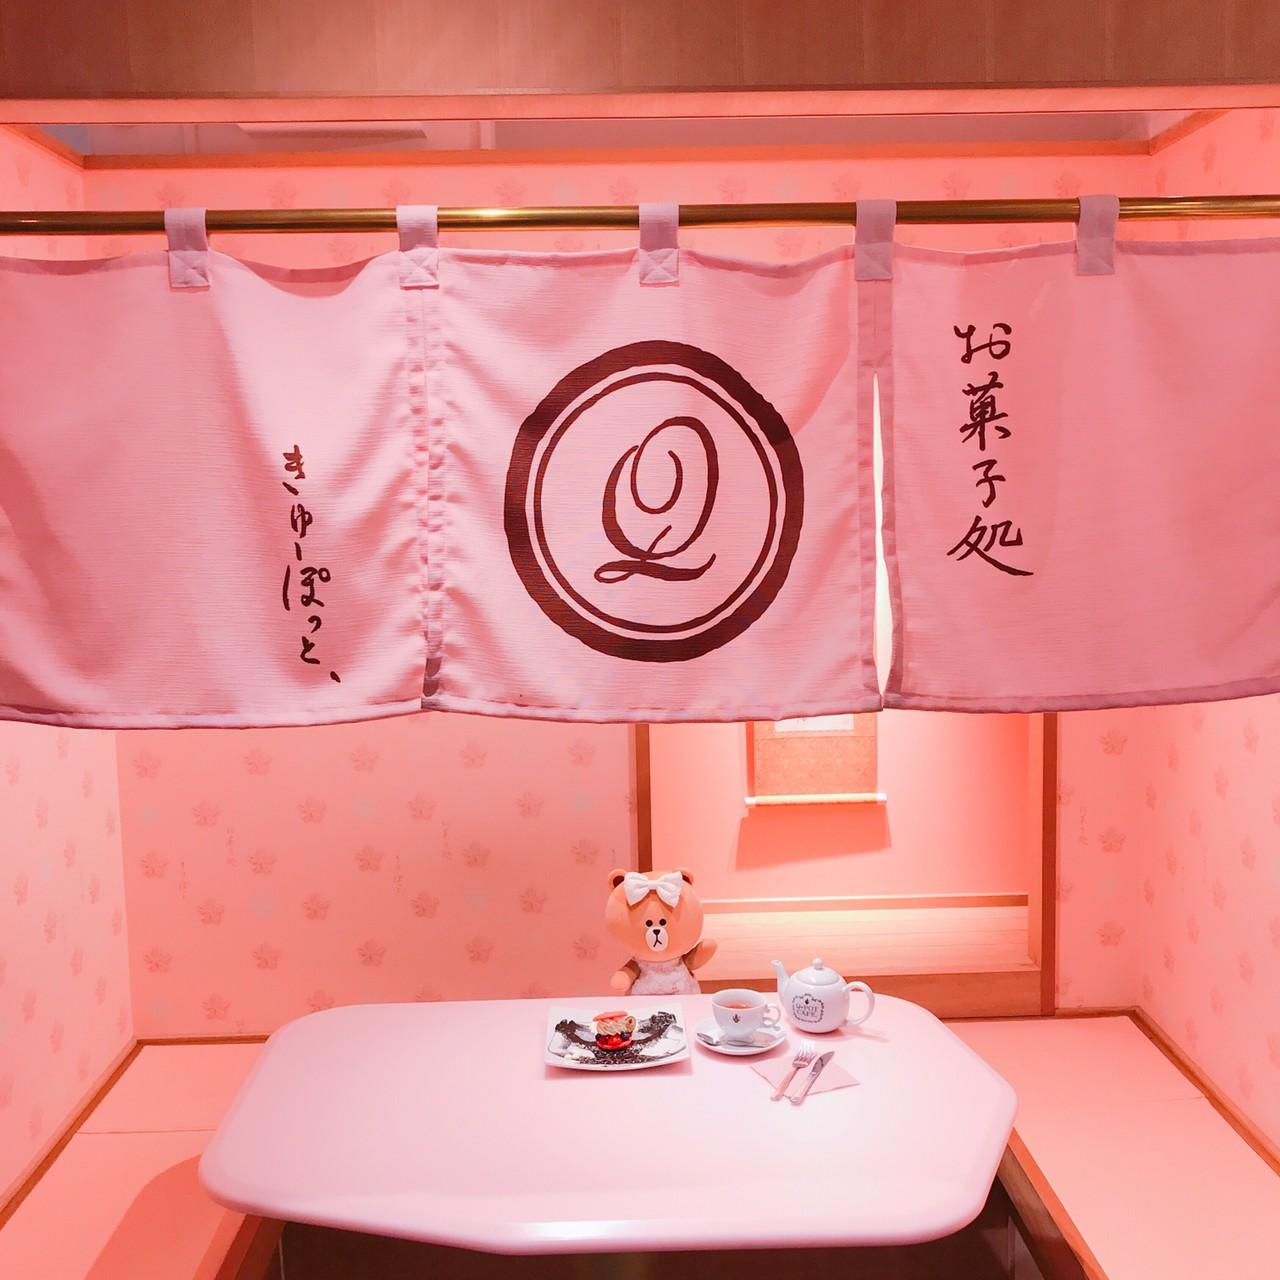 #ThisisCHOCO 【003】食べられるアクセサリースイーツ!?♡かわいさ満点の「 Q-pot CAFE. 」